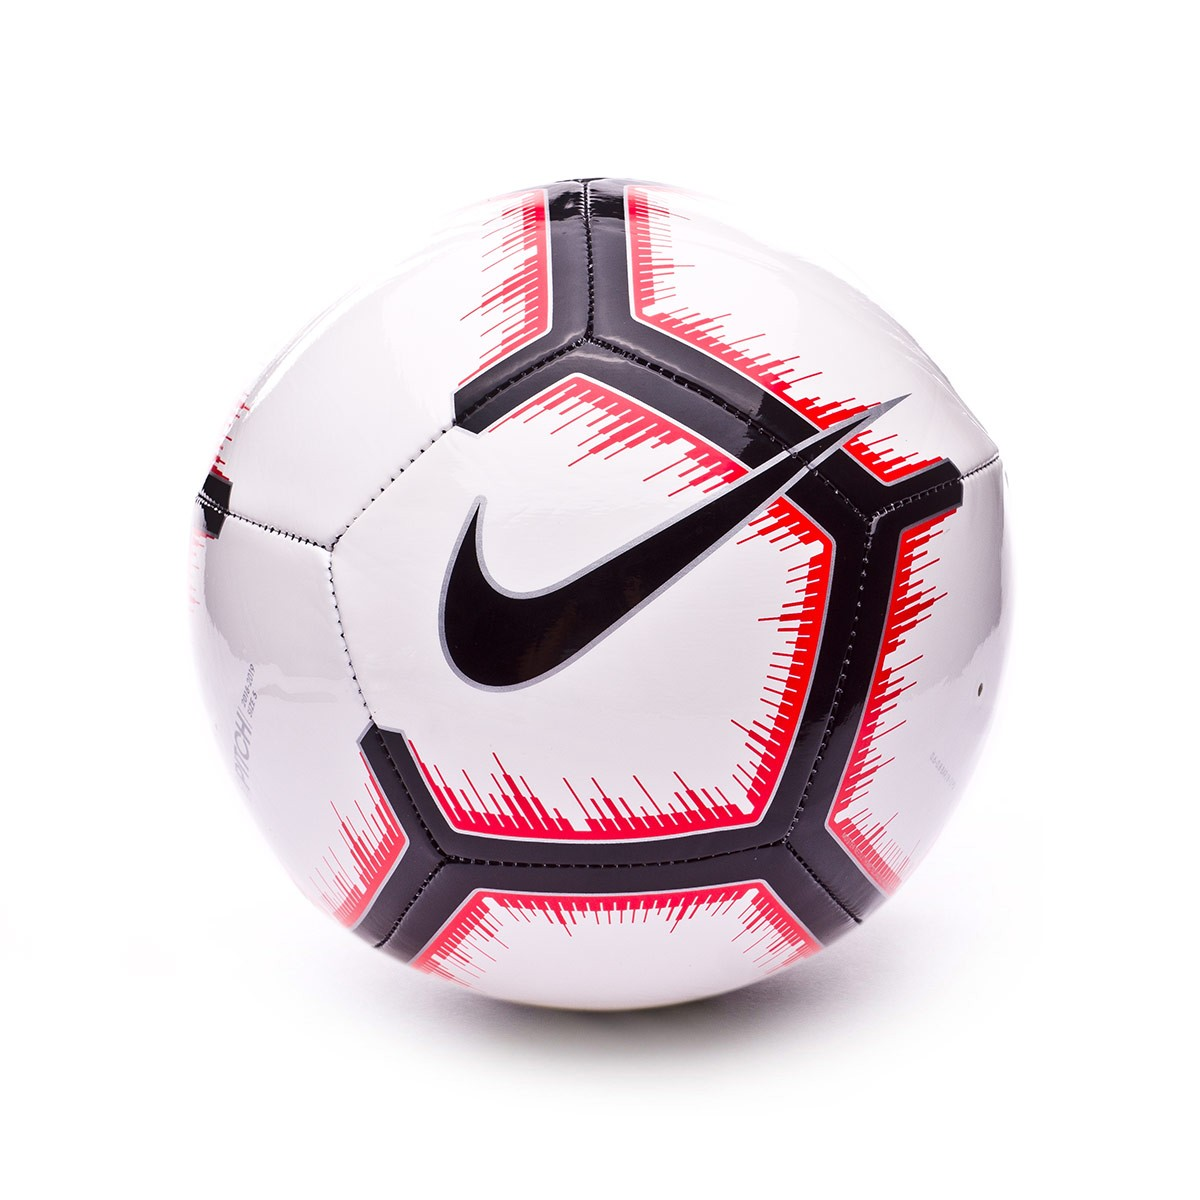 Ball Nike Pitch 2018-2019 White-Bright crimson-Black - Football store  Fútbol Emotion a410a5e9b127f